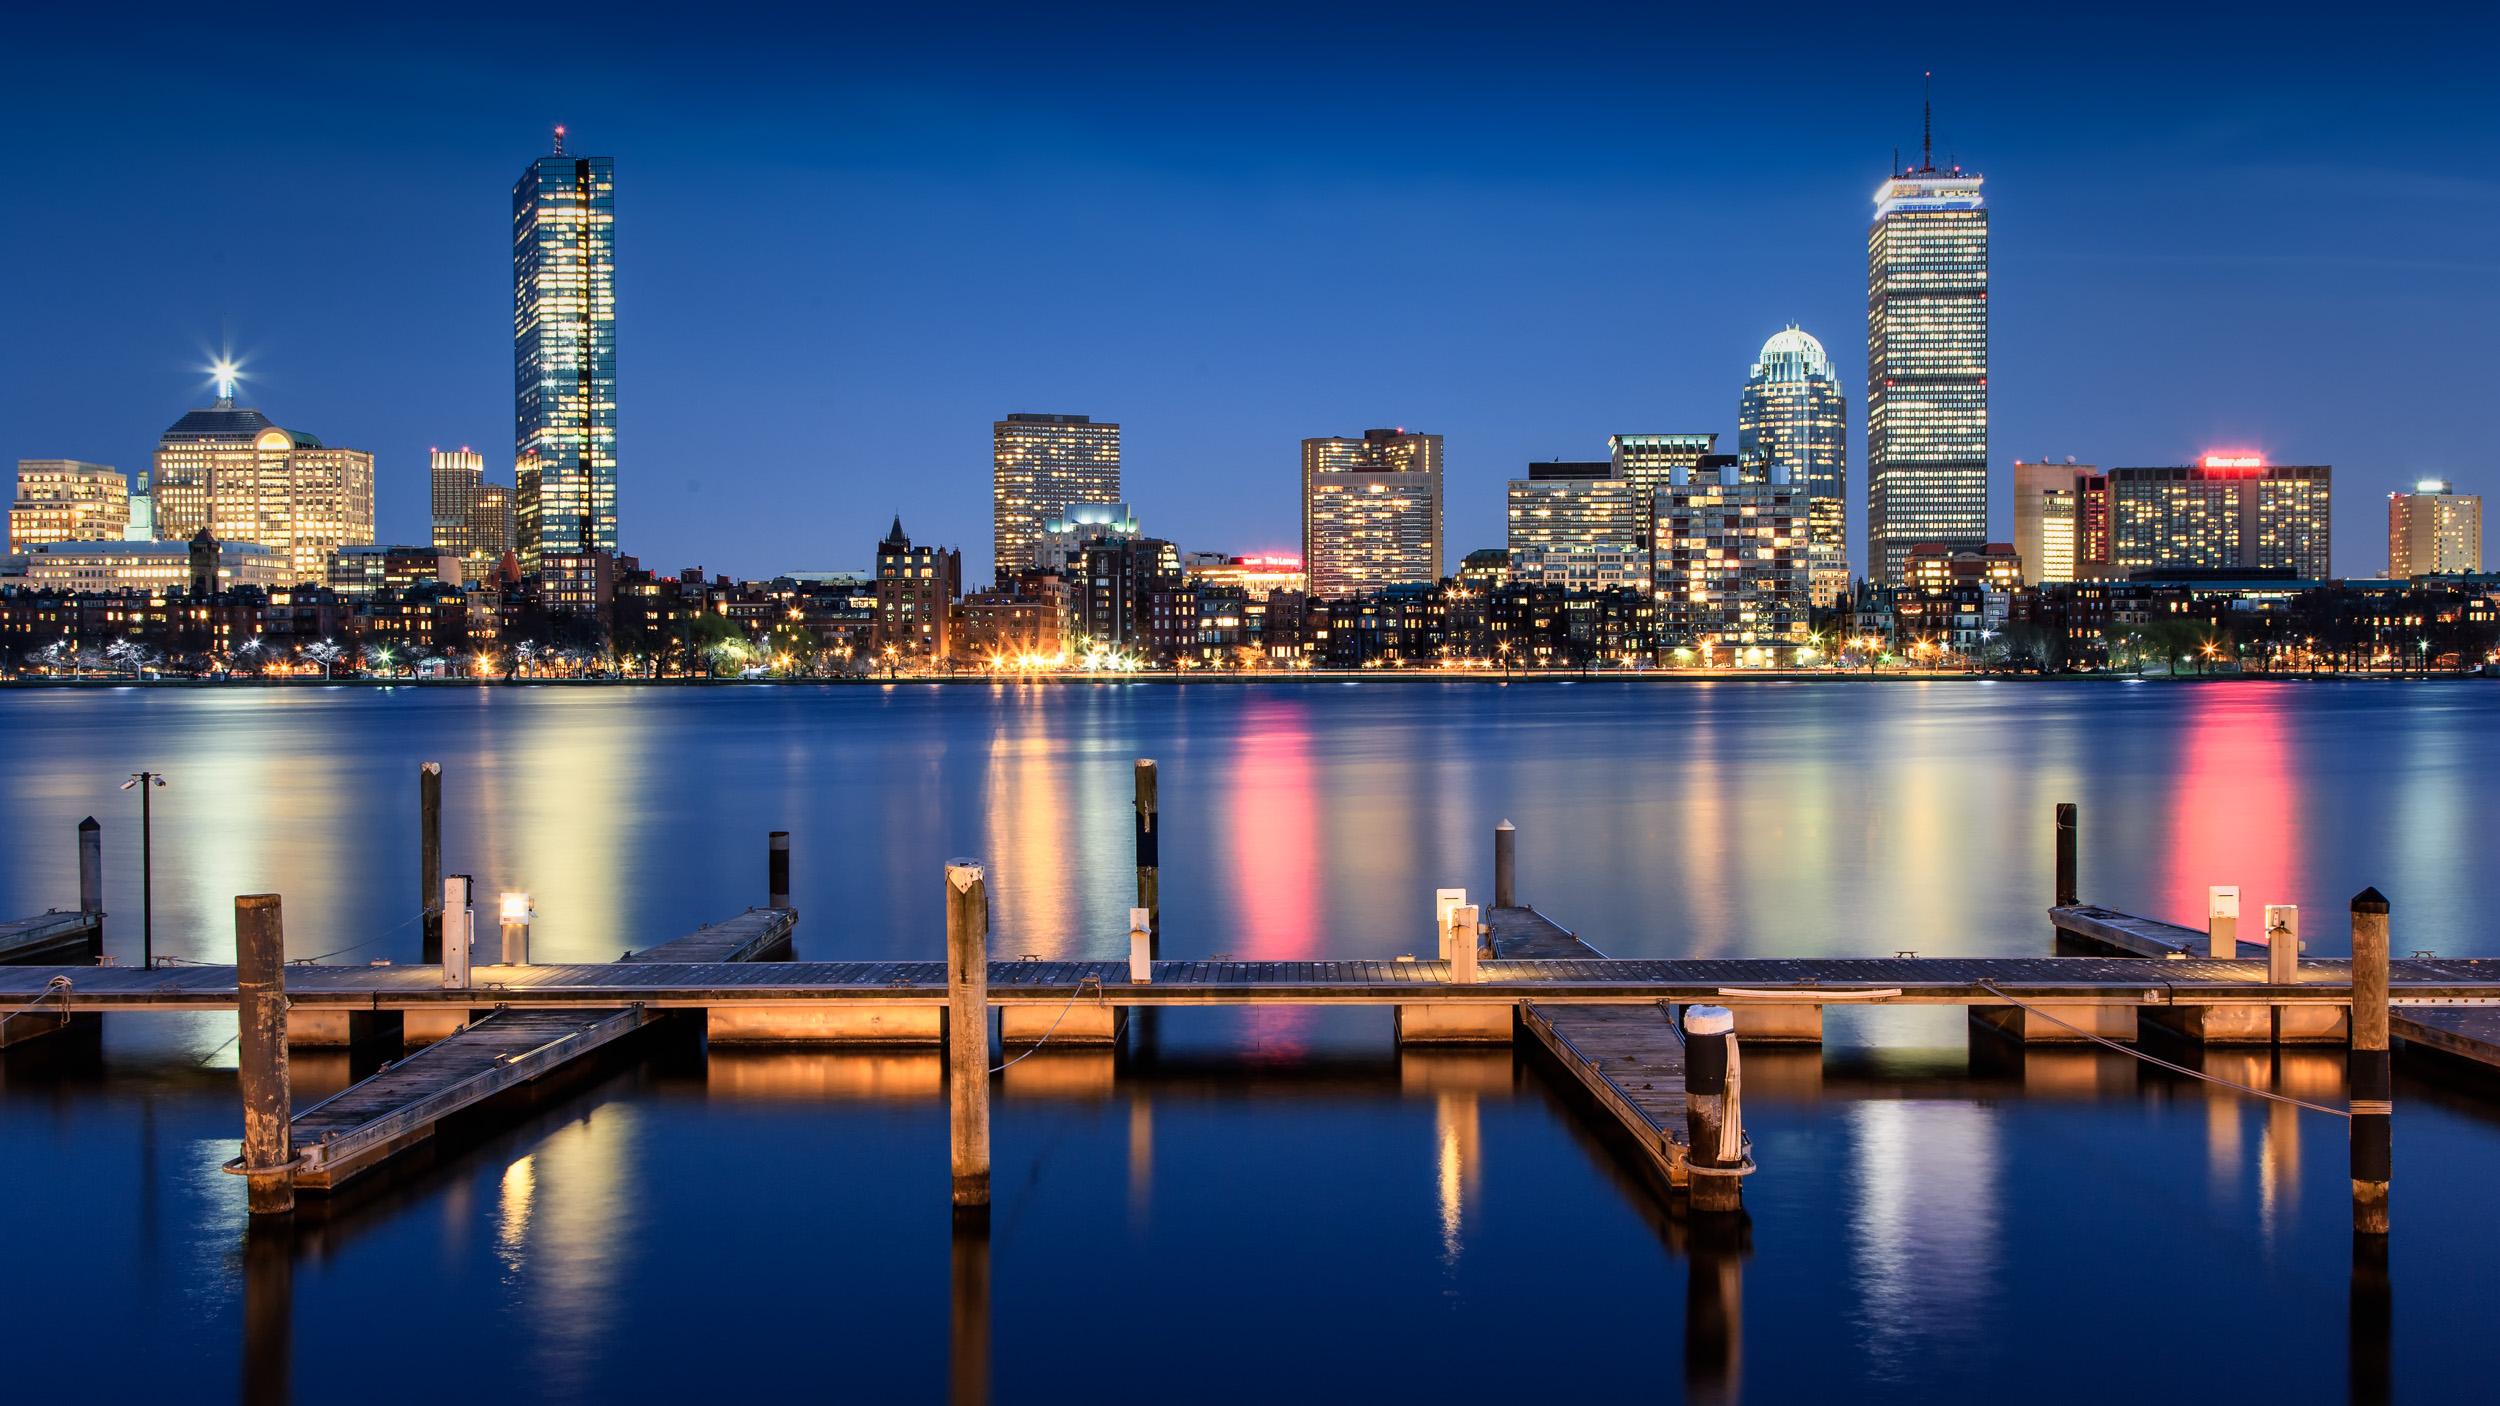 Boston_from_MIT_Miami_Fort_Lauderdale_commercial_photographer_Franklin_Castillo.jpg